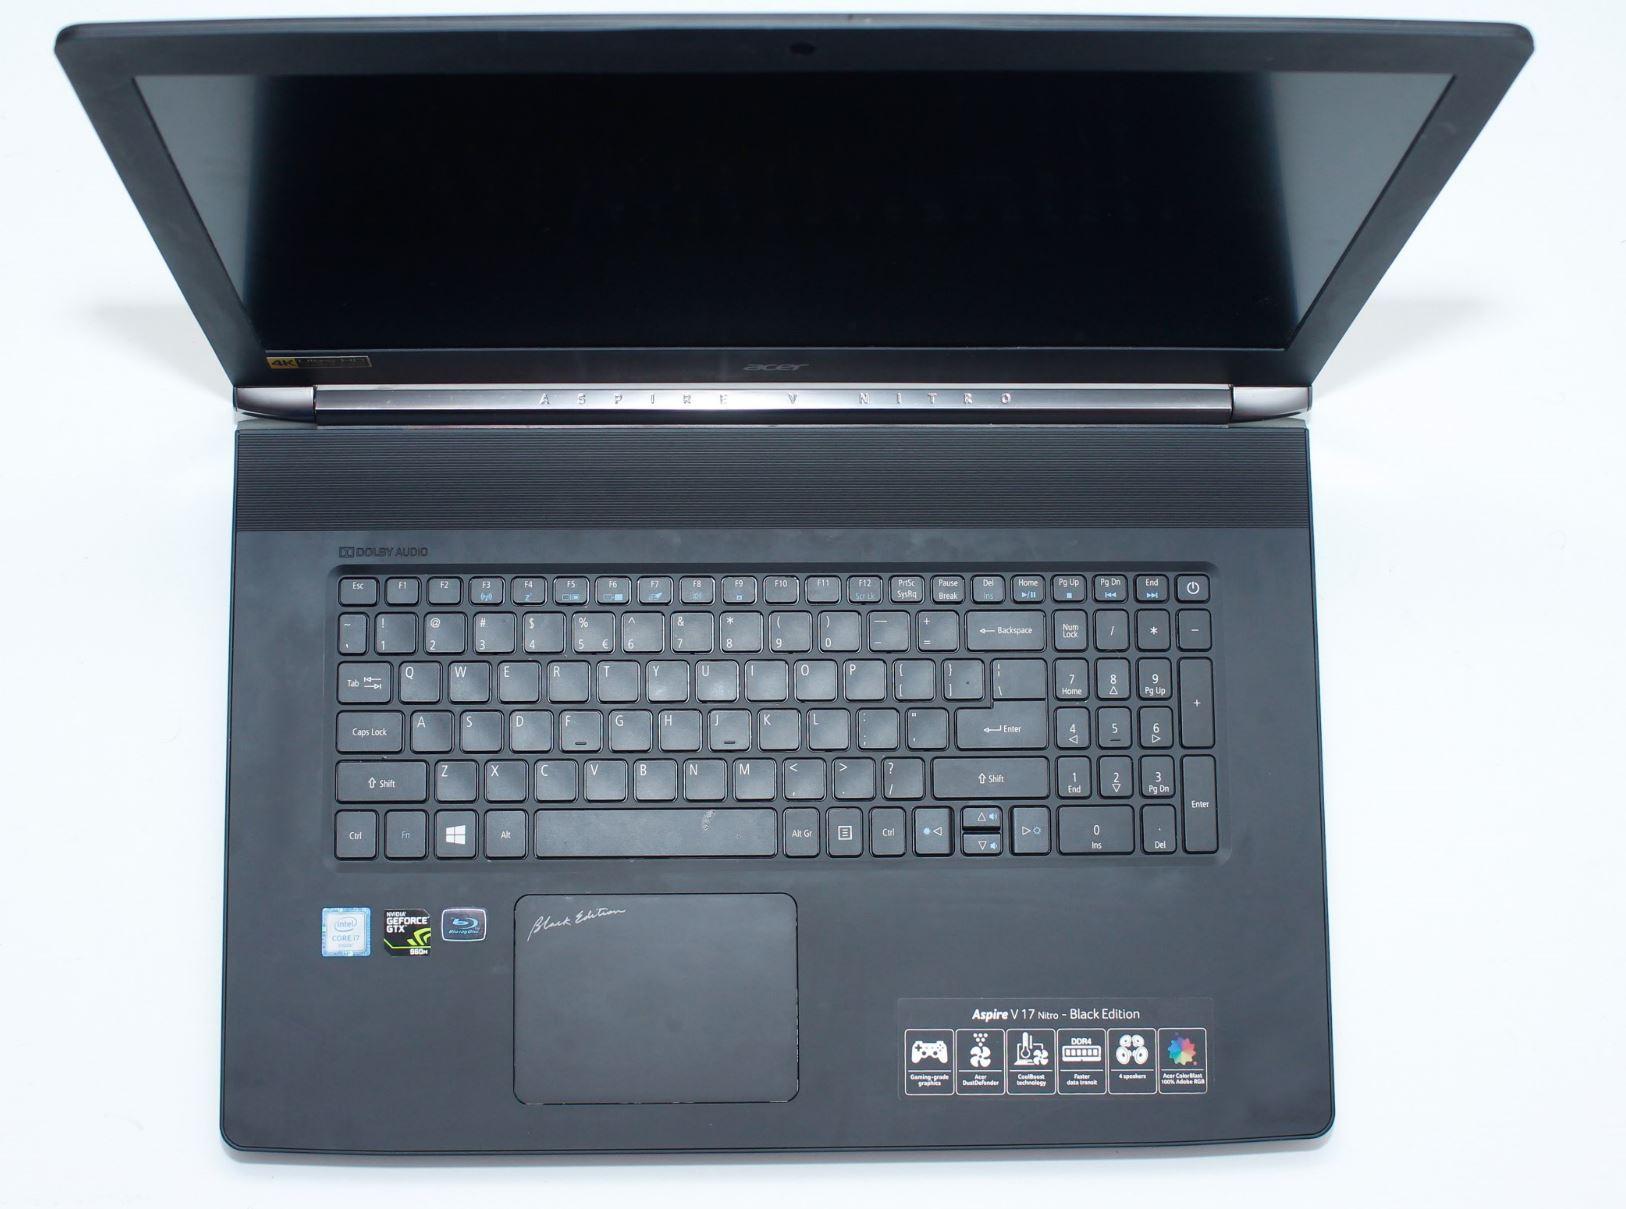 acer nitro arvuti 57684592678925626549856594859548565289